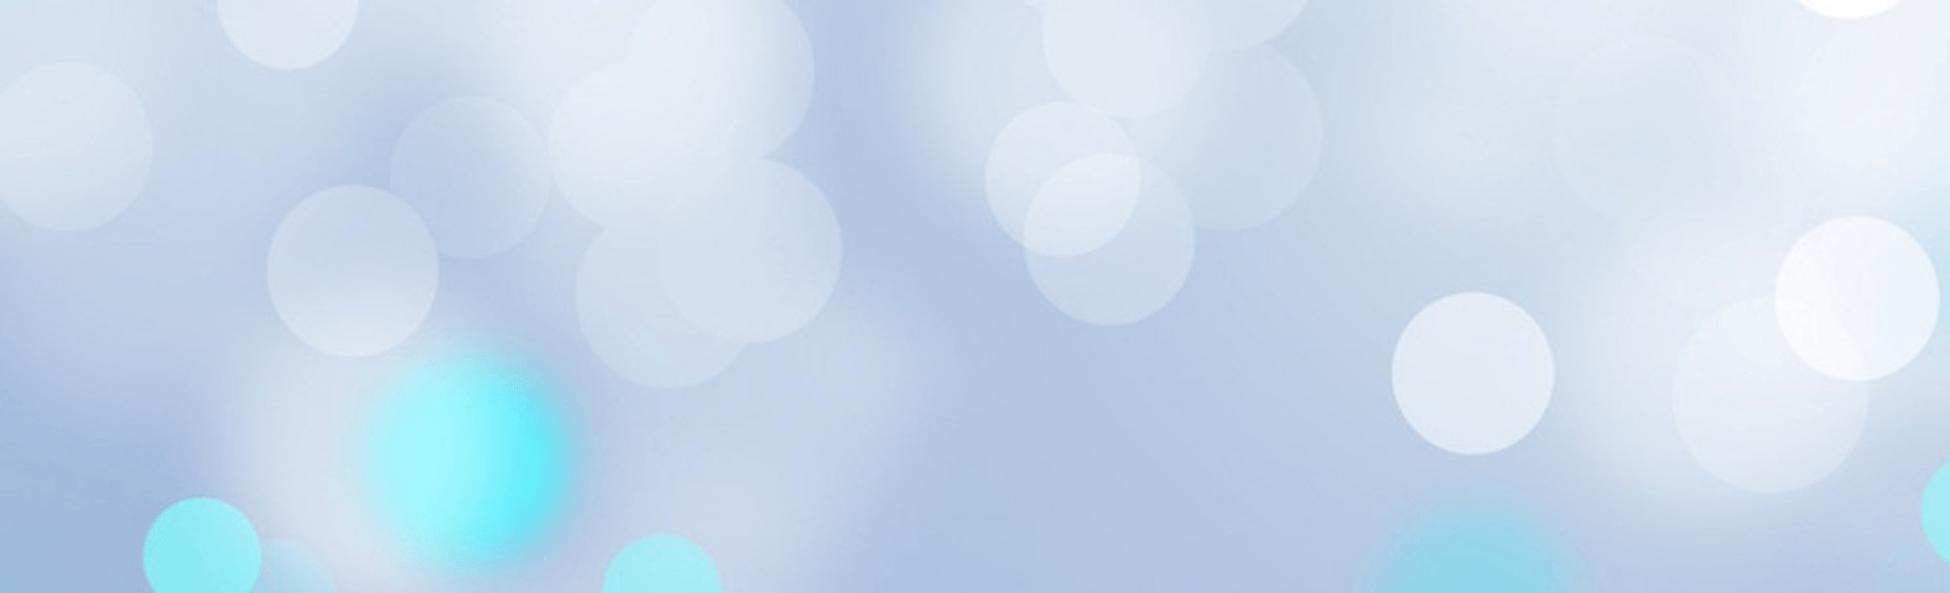 blurry-lights-